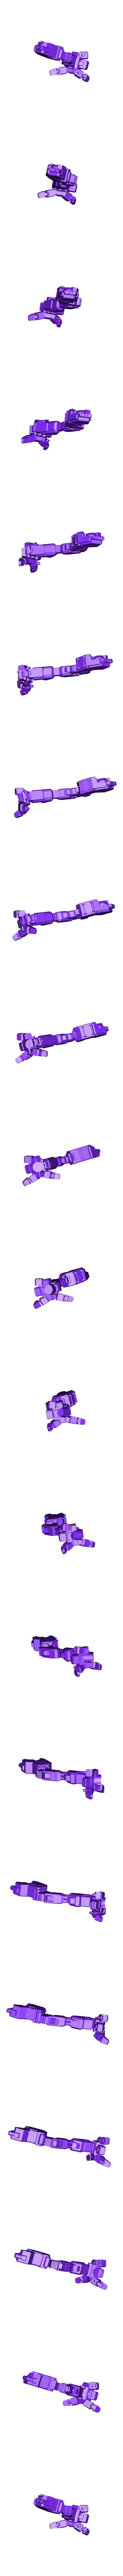 Locust_Statue_Mech_Leg_L.stl Download free STL file MechWarrior Online Locust Statue • 3D printer object, Solid_Alexei